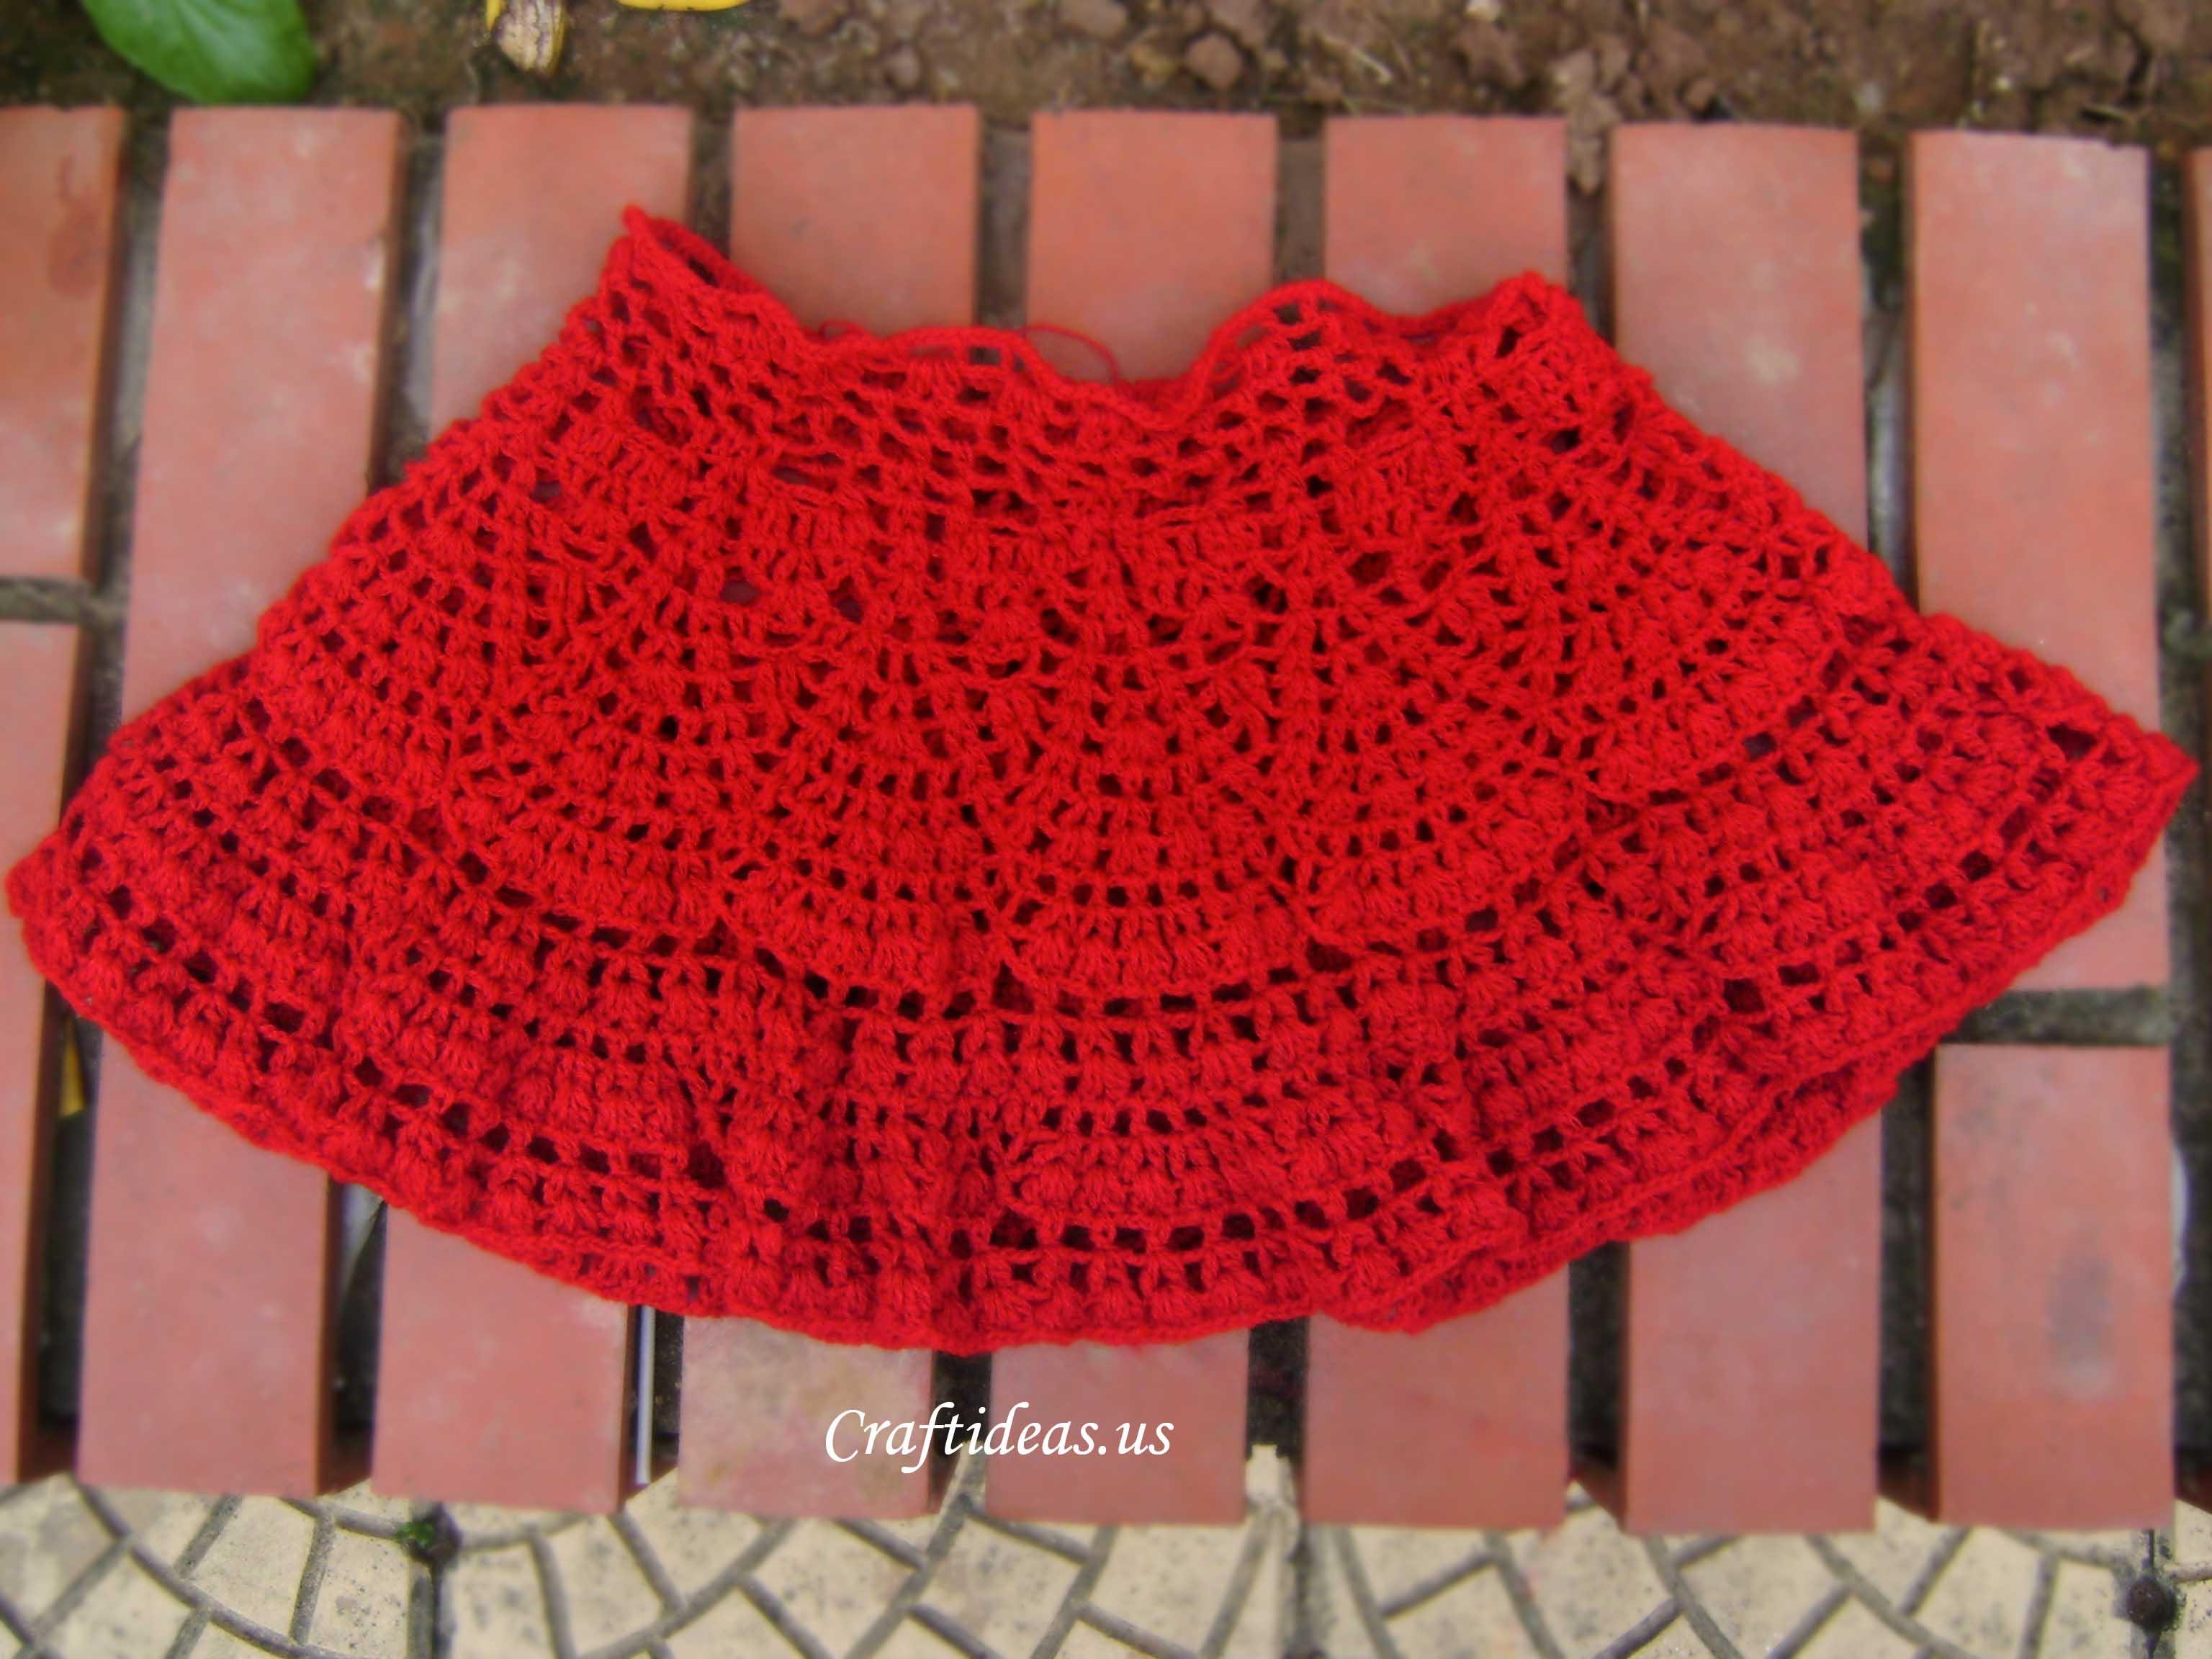 Crochet Beauty Skirt For Little Girl Craft Ideas